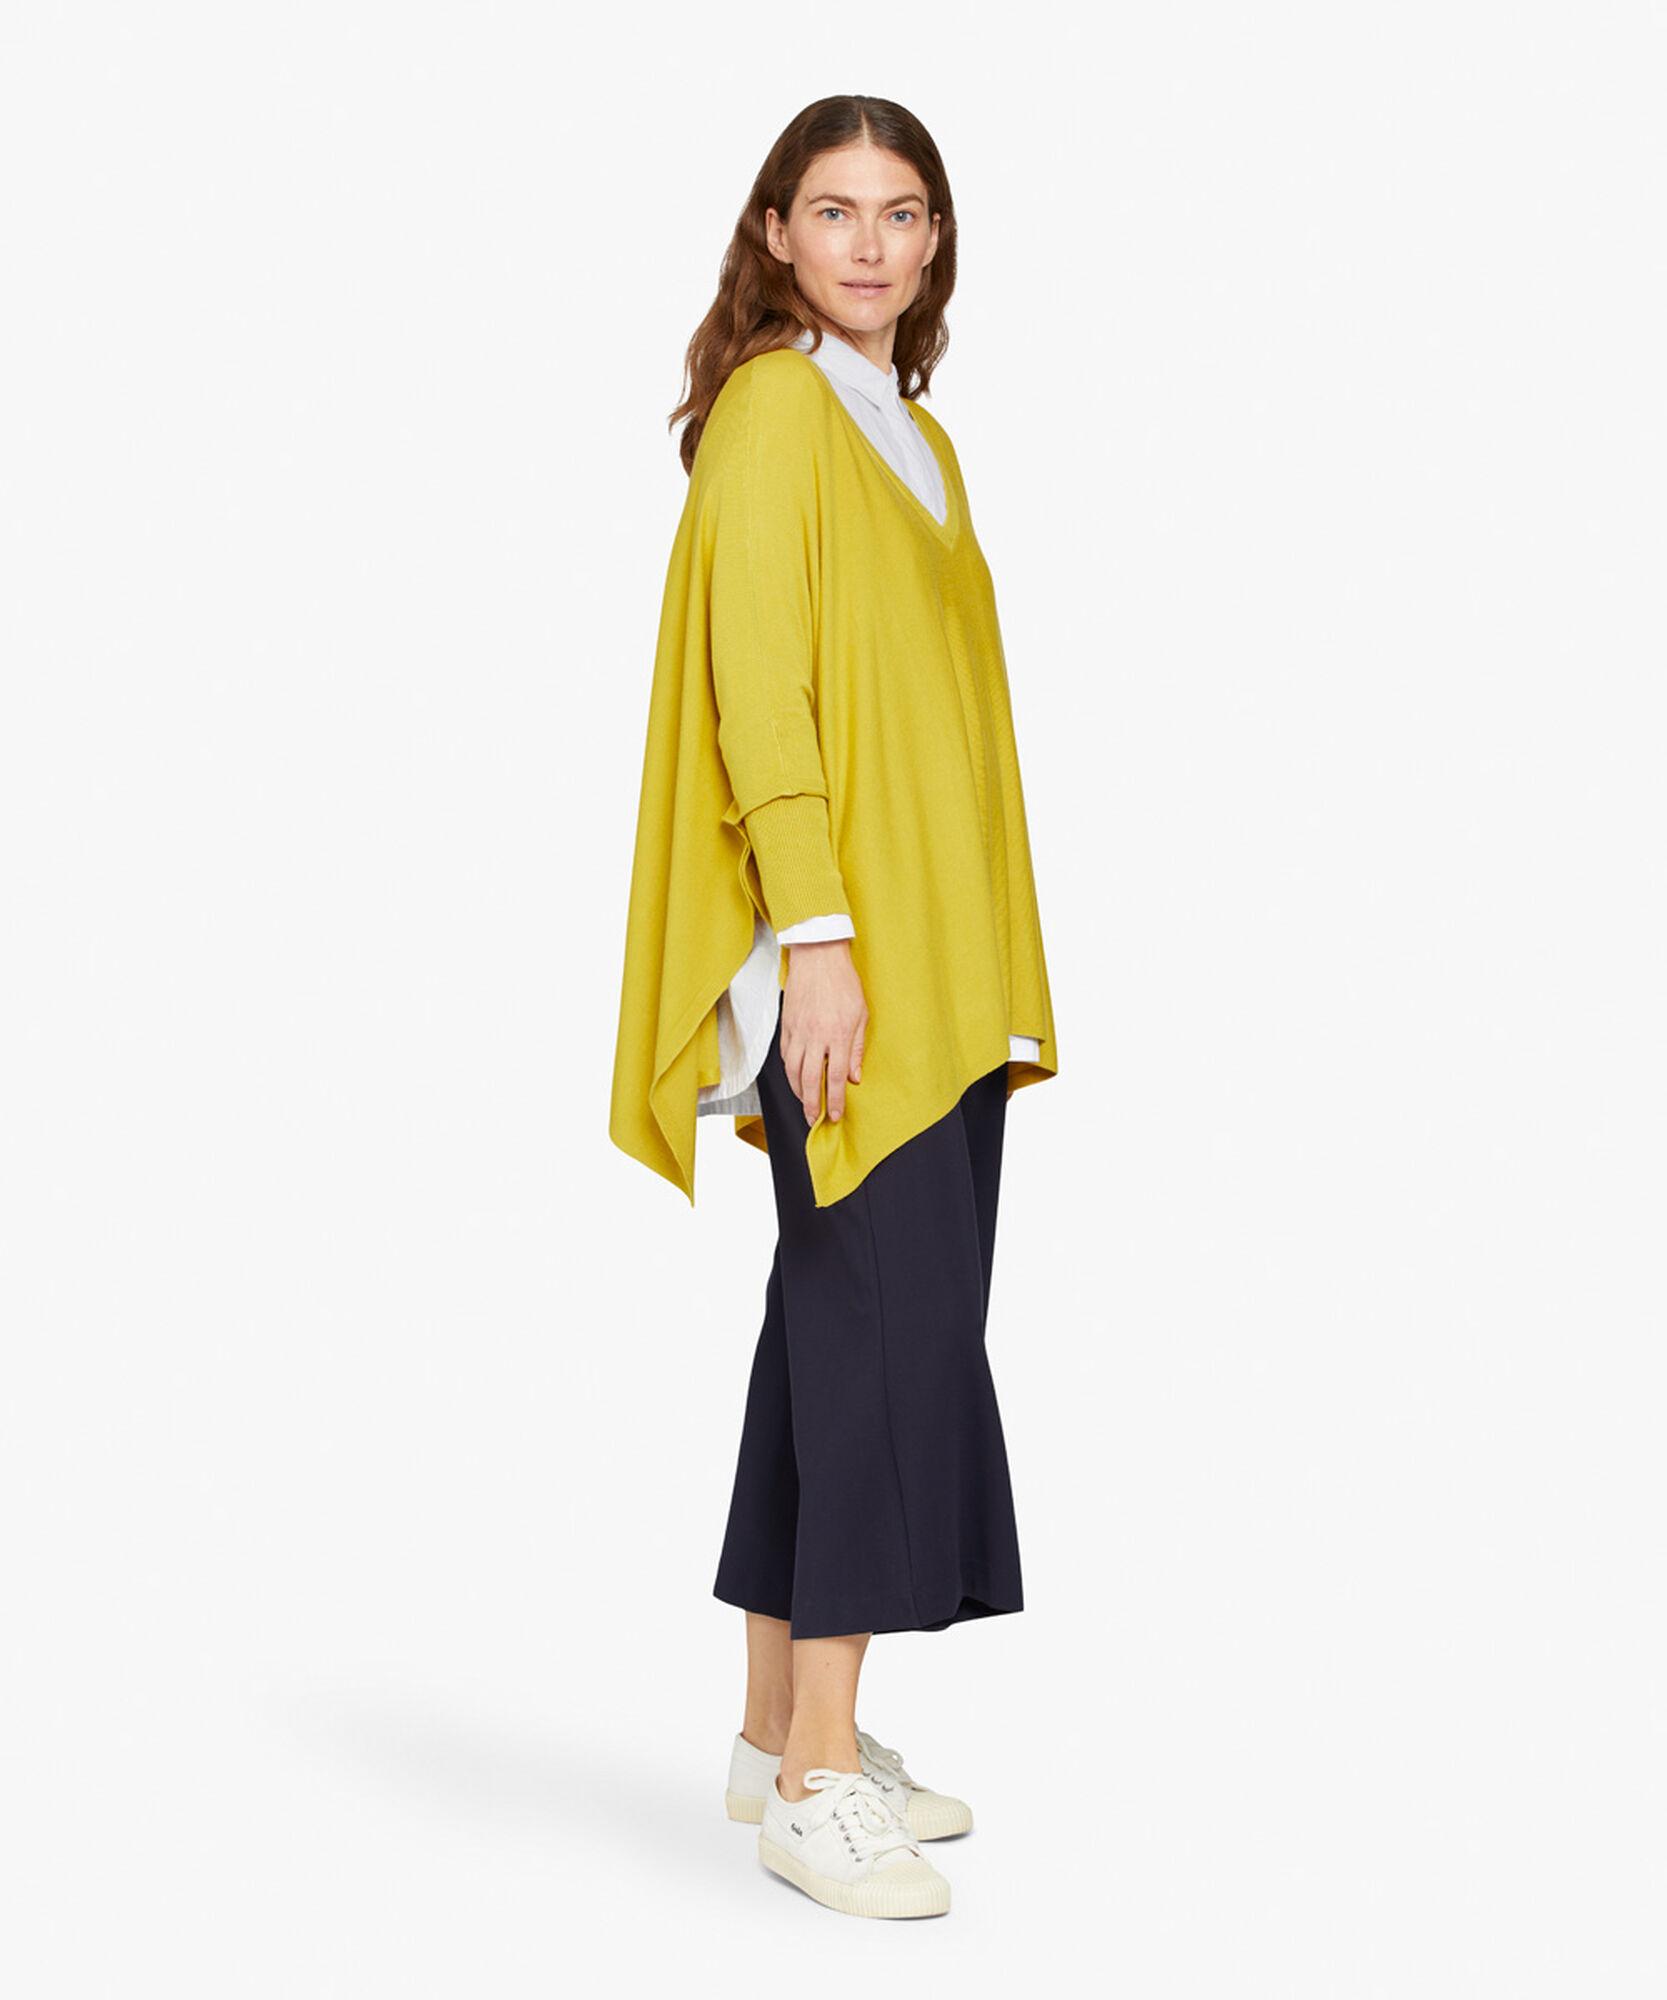 FOSNA TOP, Oil Yellow, hi-res